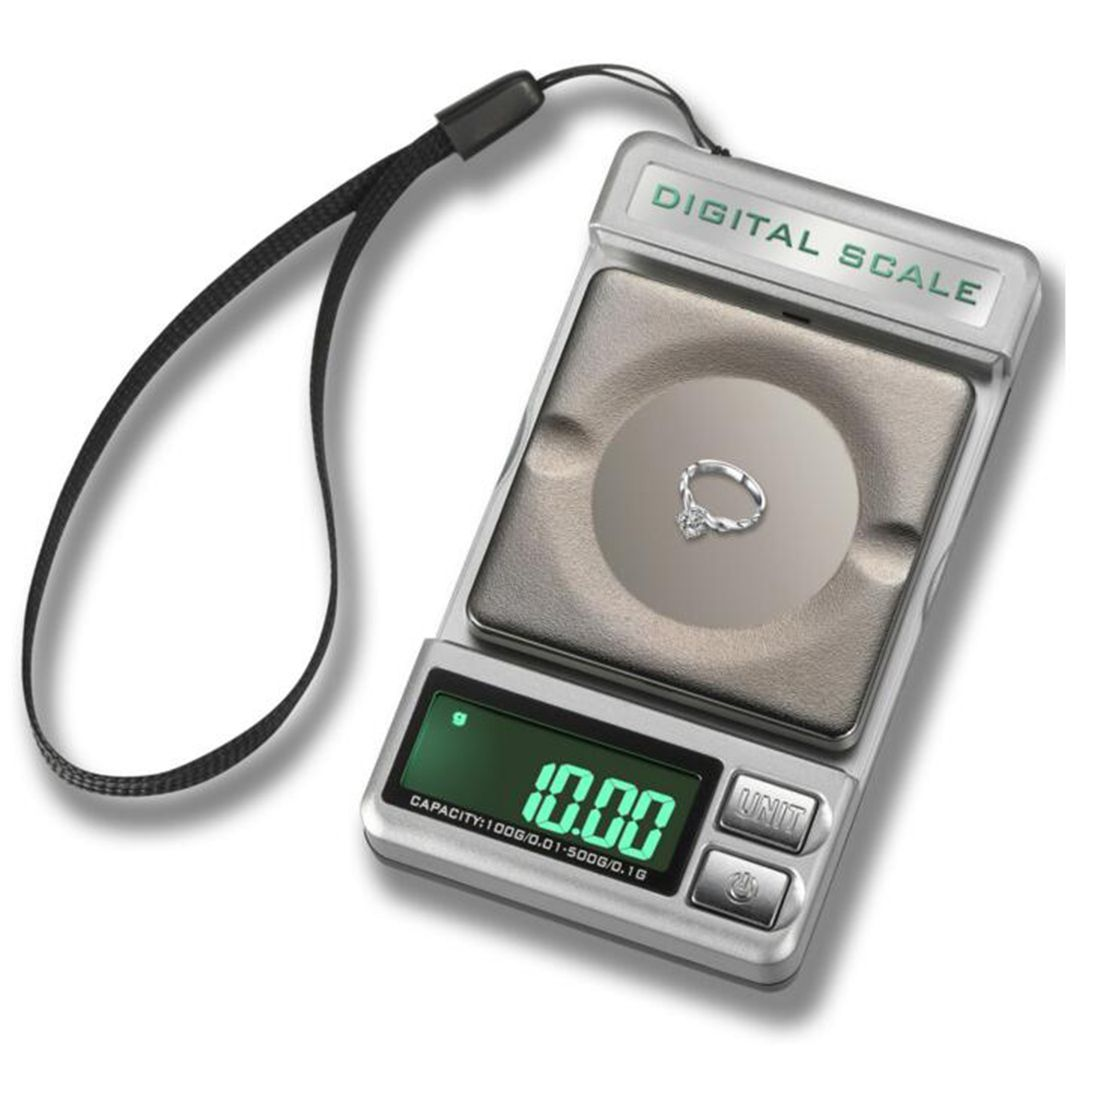 Big Sale LCD Display Electronic Digital Jewelry Pocket